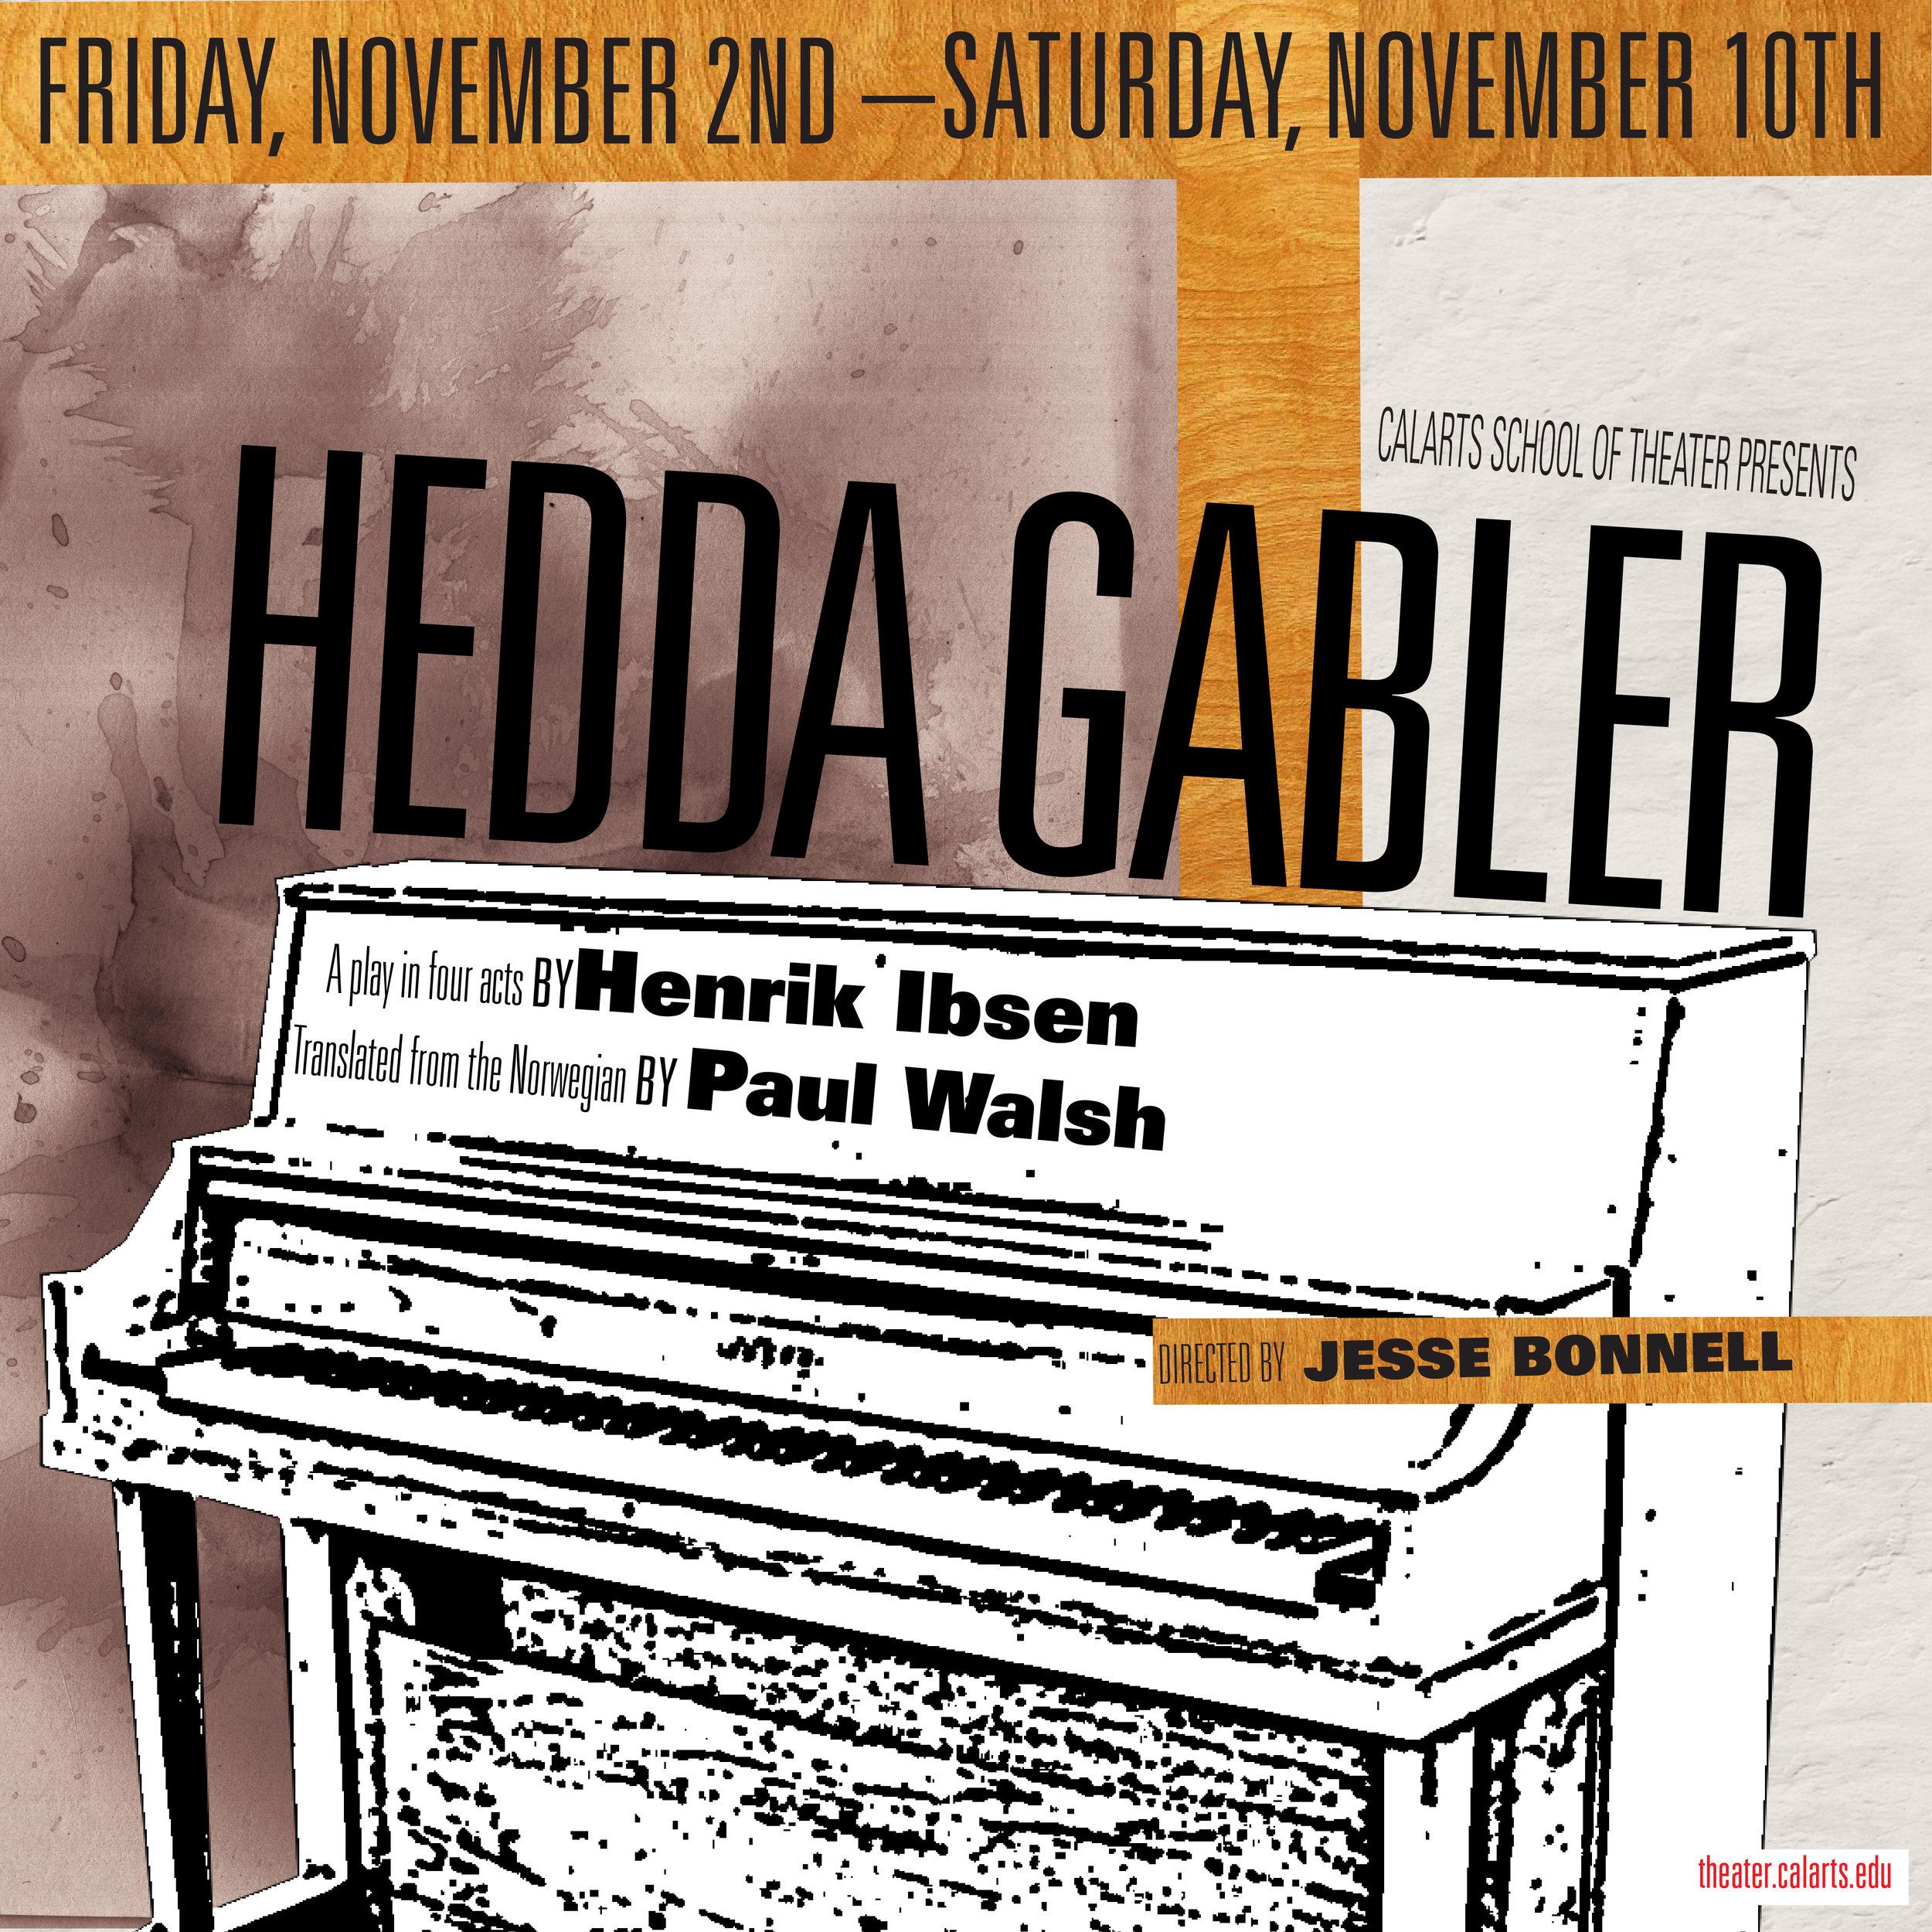 Hedda Gabler -